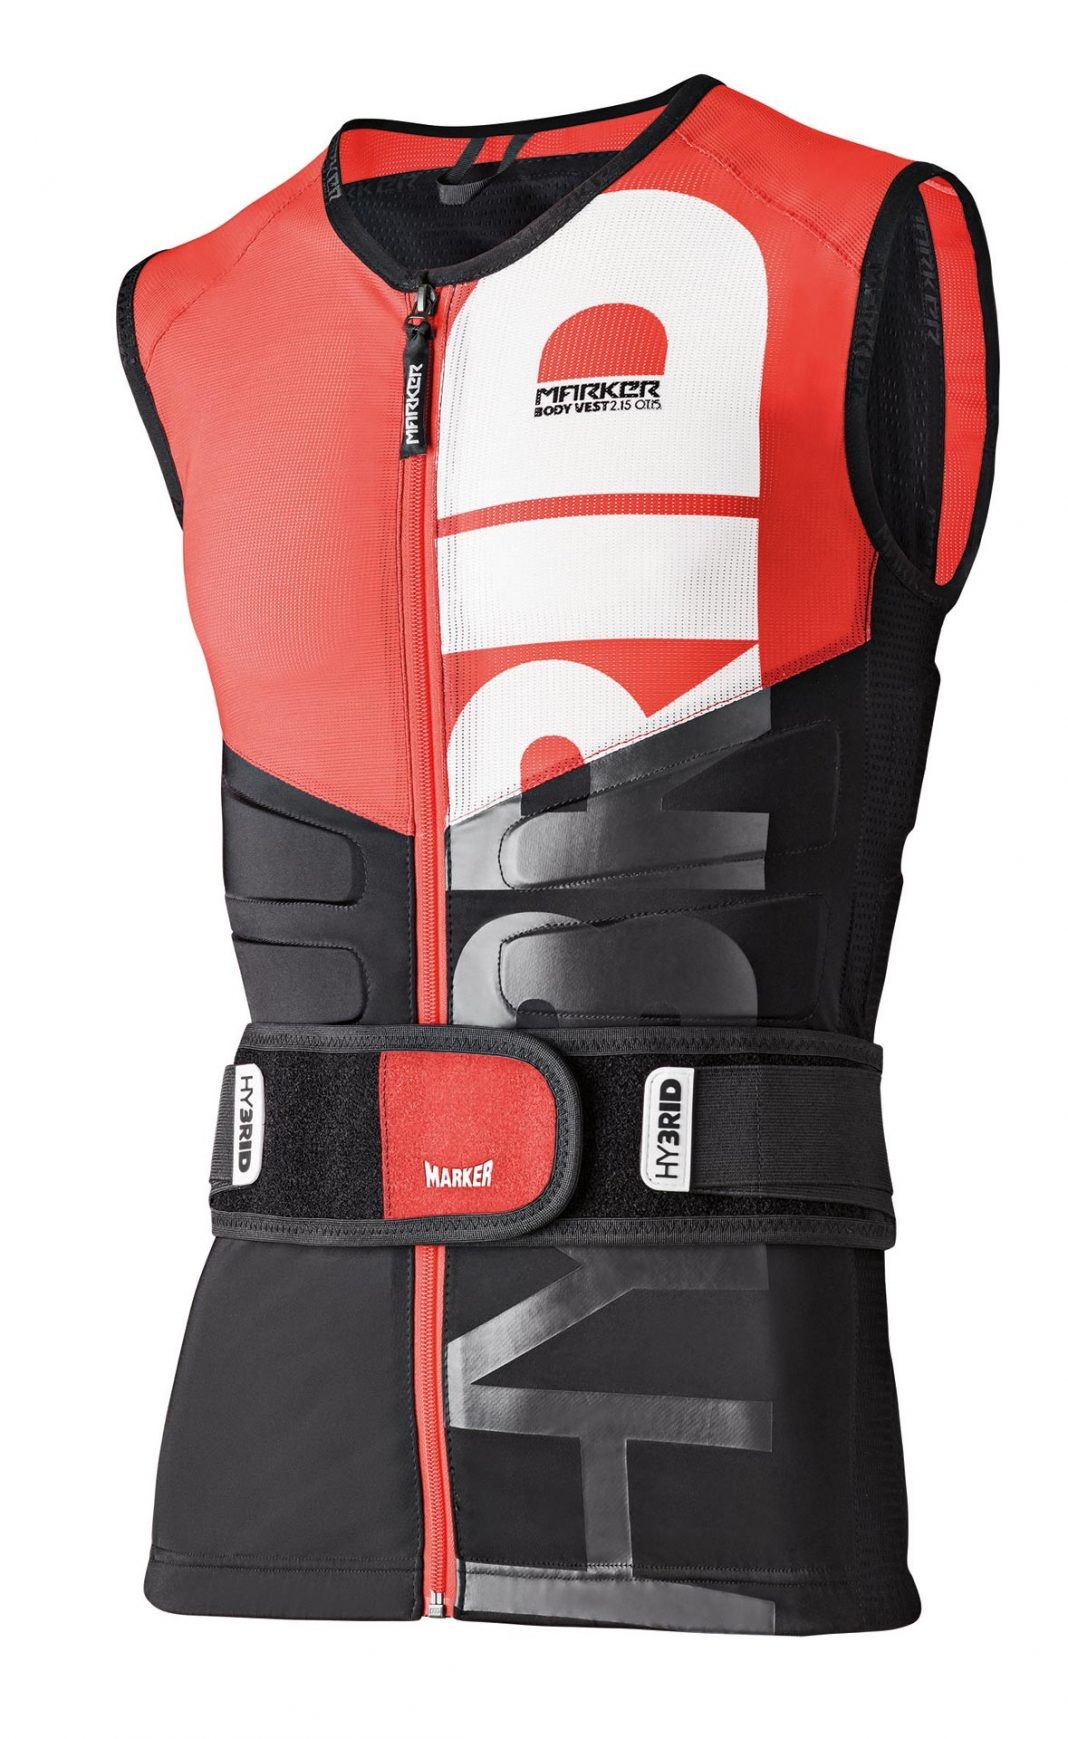 Marker: Hybrid 2.15 Body Vest